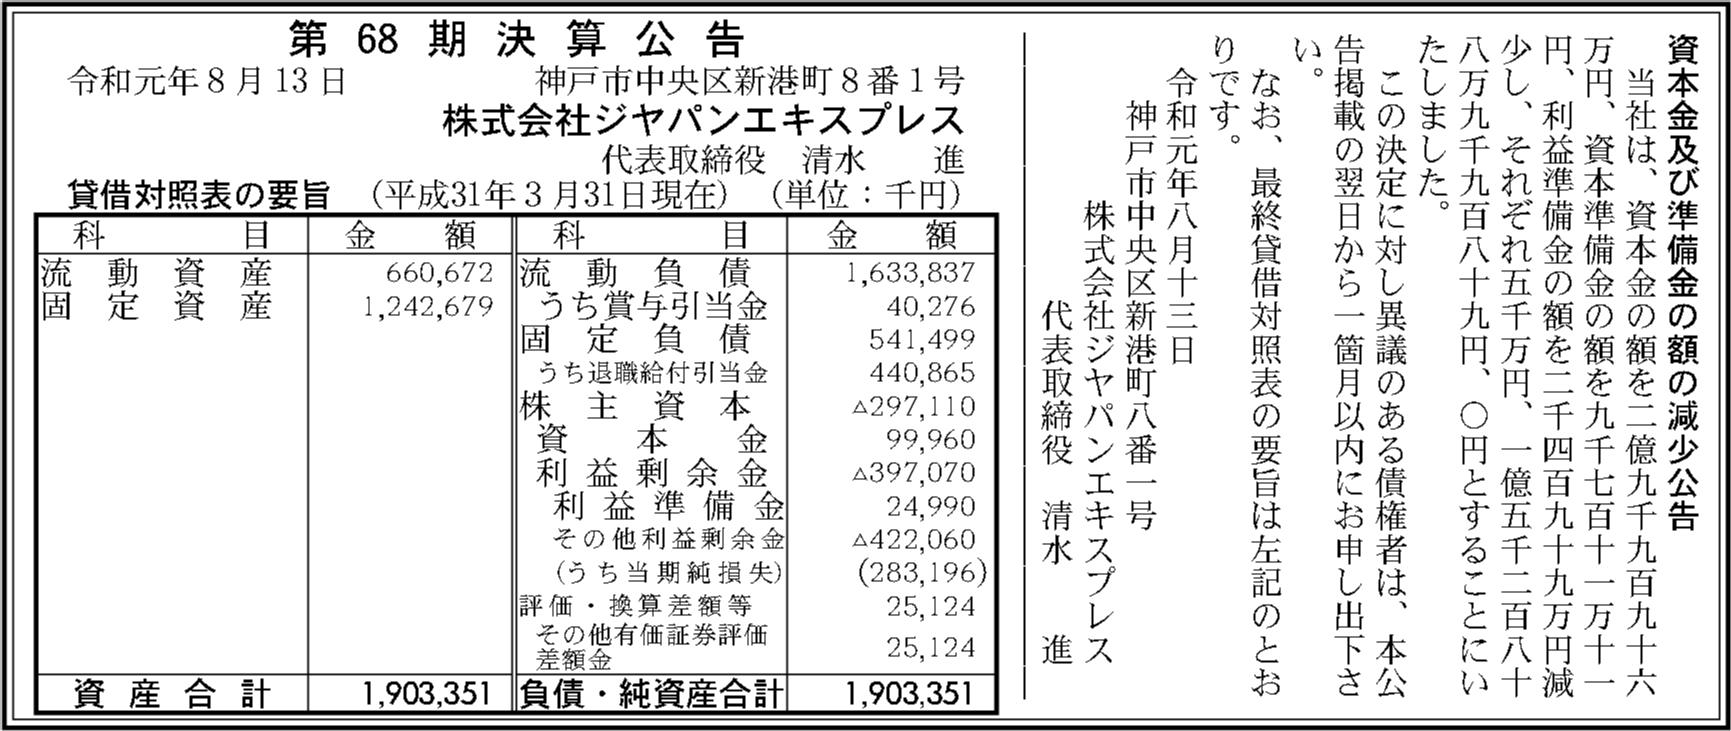 0067 91d7ea6e0bedab6ace884415cefa1ac6cd30b61bd19c1fe9e2b8ac84a6b9b4e1e042688b98b7da8f52f3d1f20cb070018a4015ec9a500620f438b52a78672bd6 06